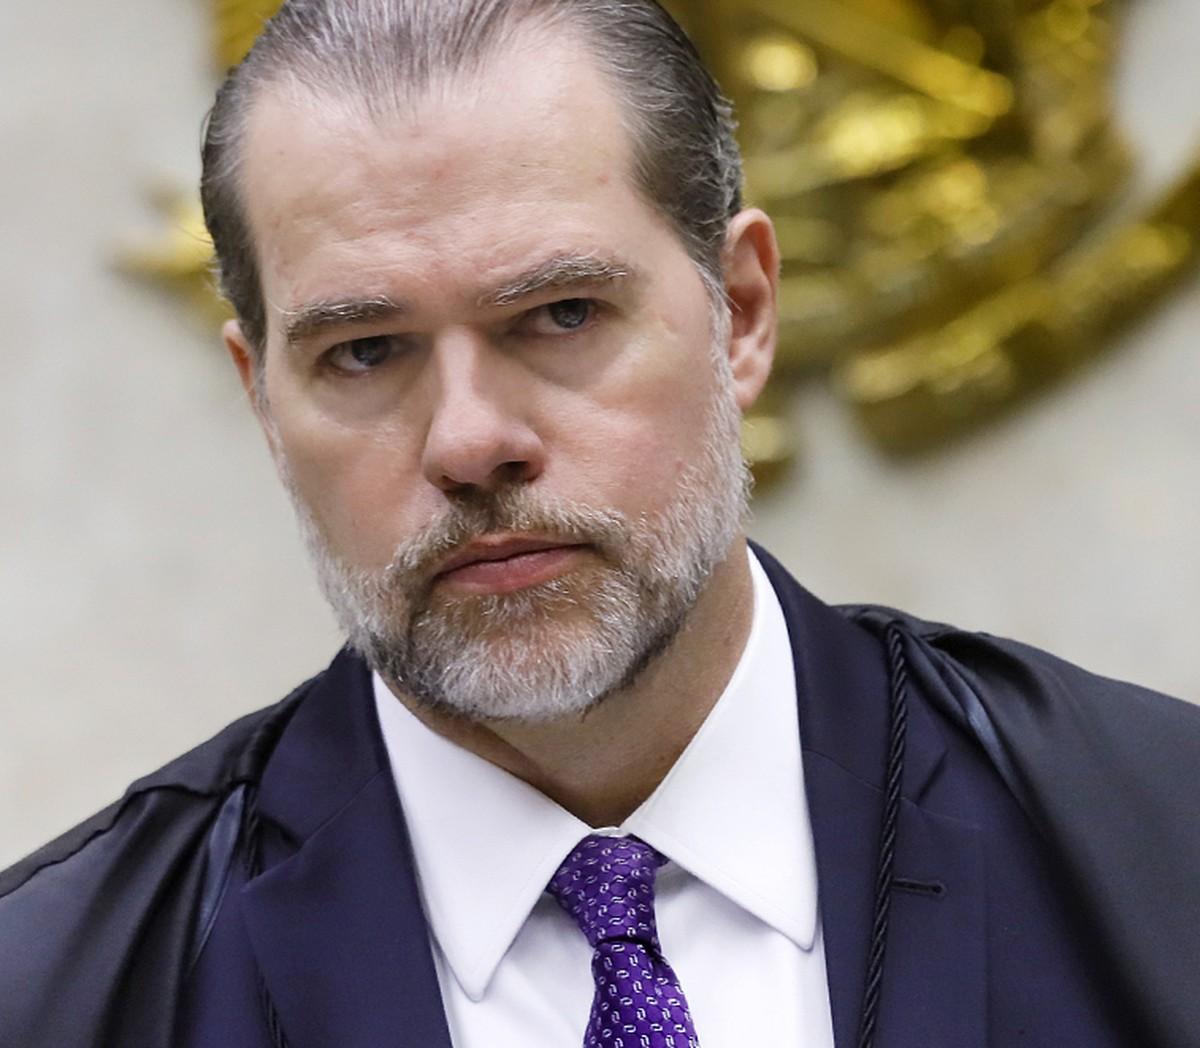 Toffoli pede inelegibilidade de oito anos para ex-juízes e procuradores – Valor Econômico